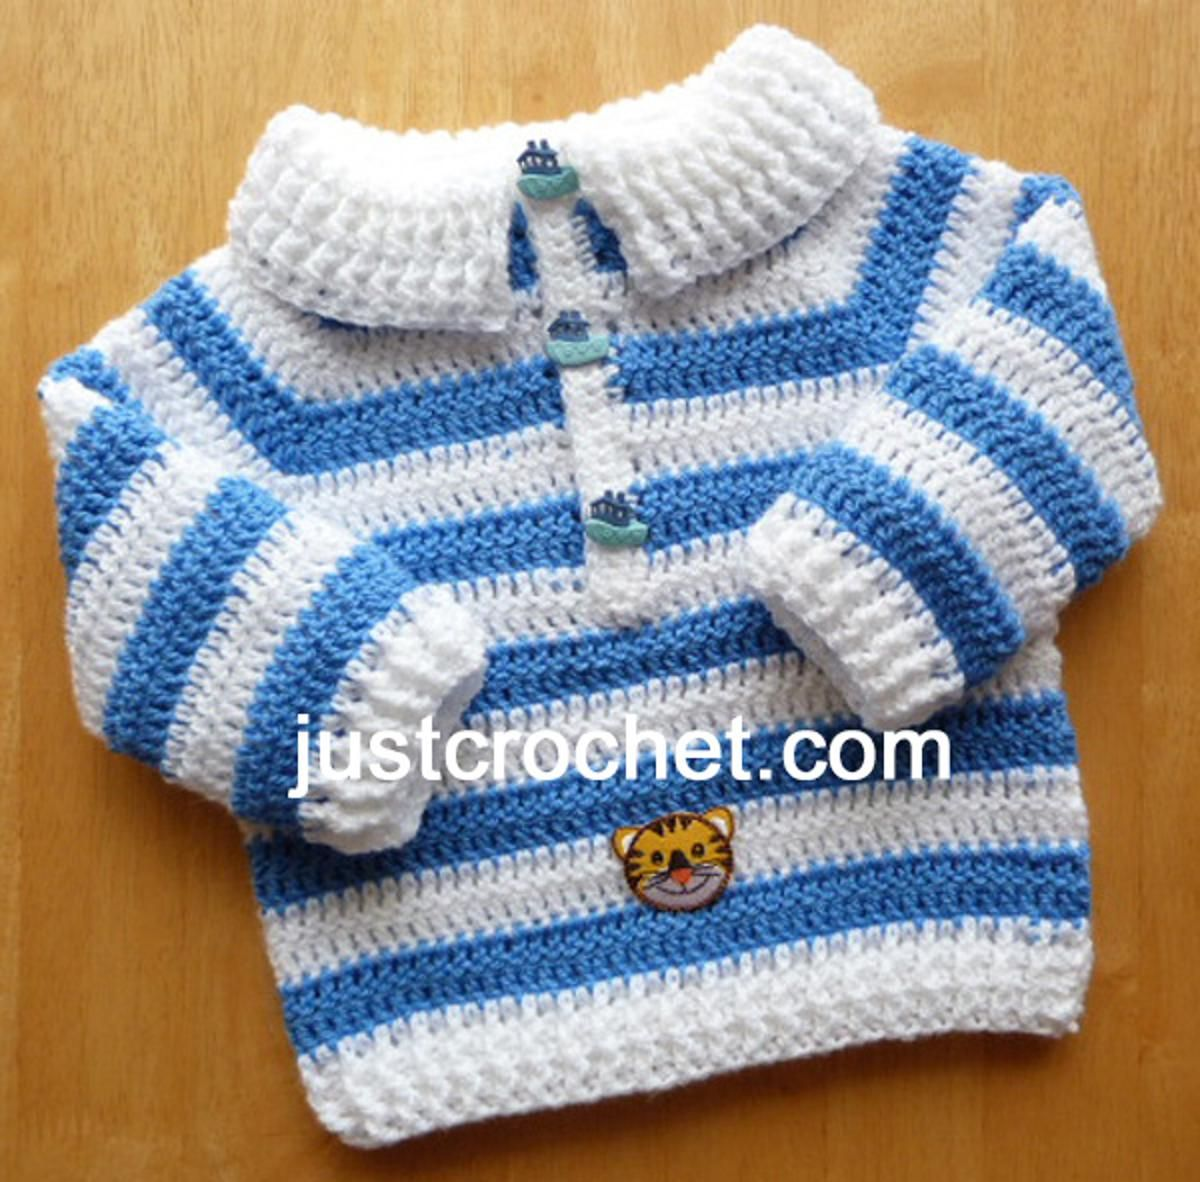 fjc122-Collared Sweater Baby Crochet Pattern | Craftsy | baby boy ...